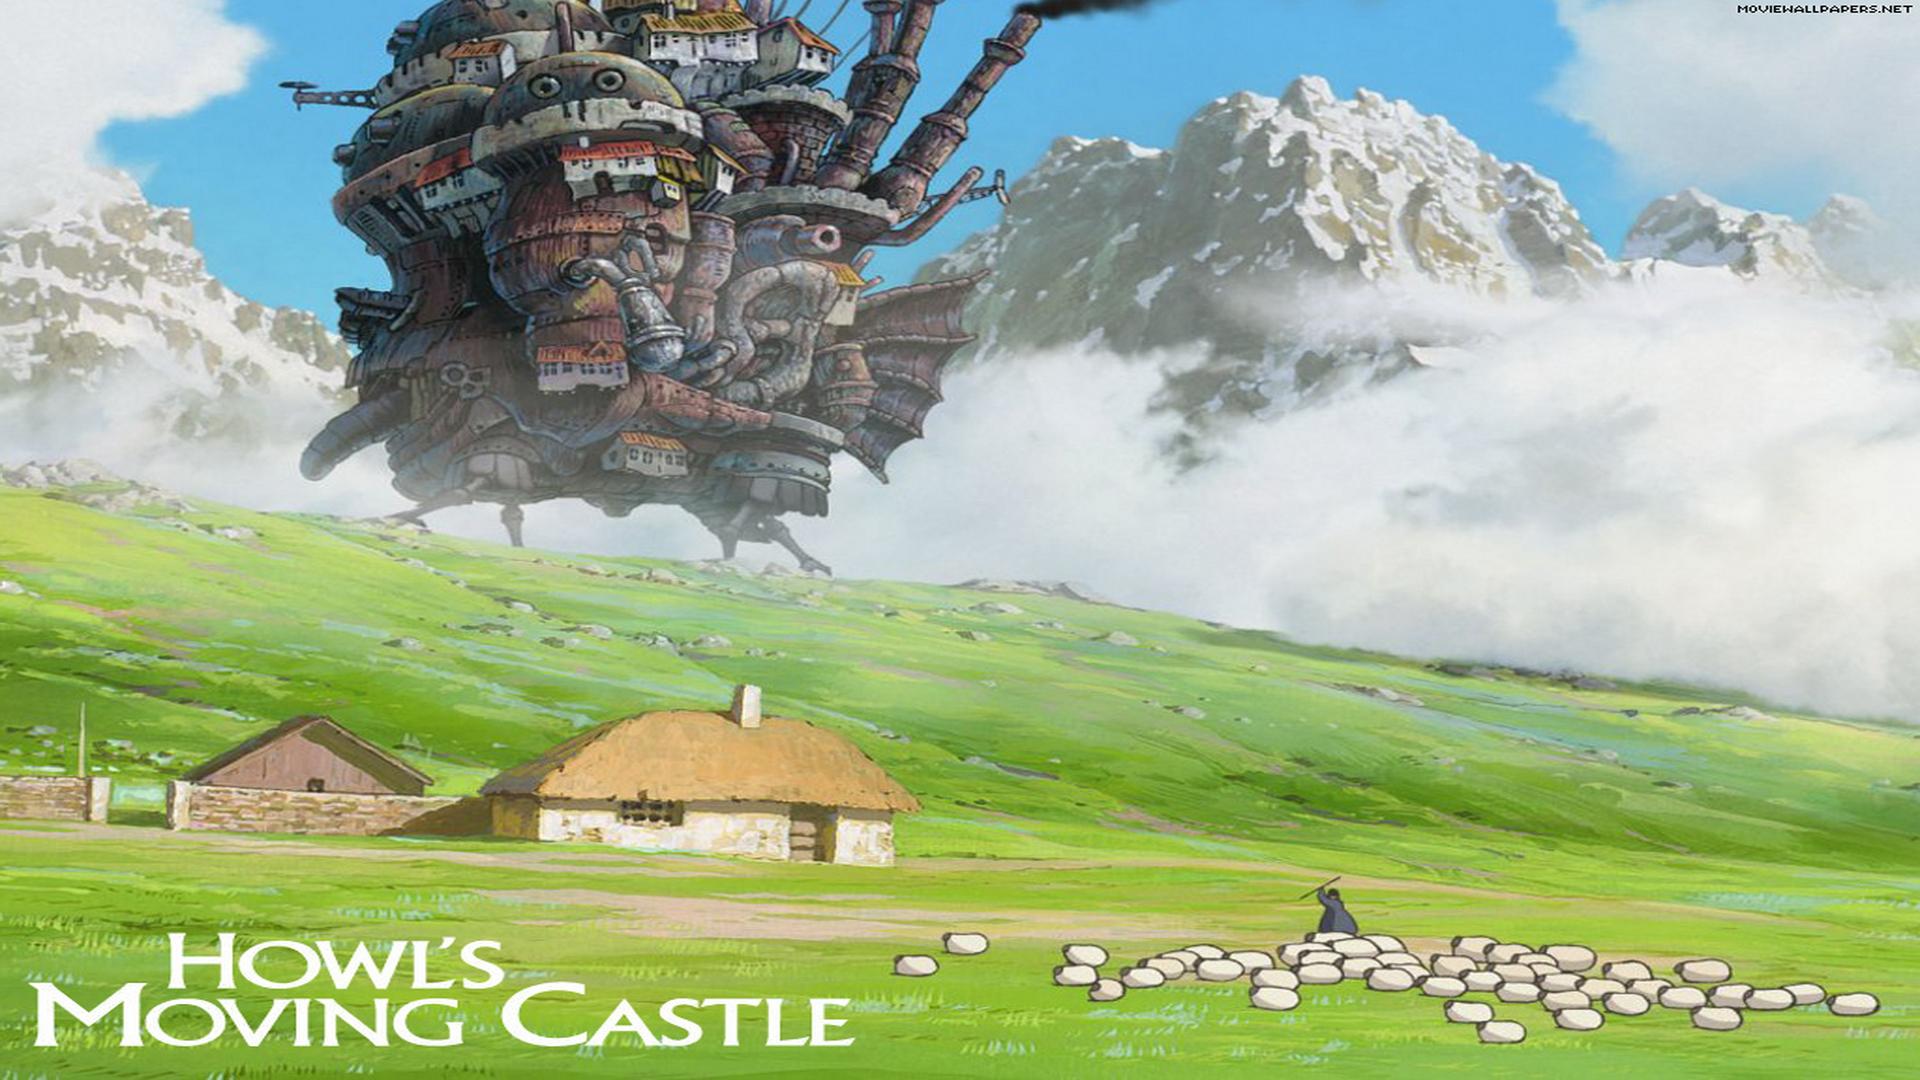 desktop wallpaper castle howl s - photo #41